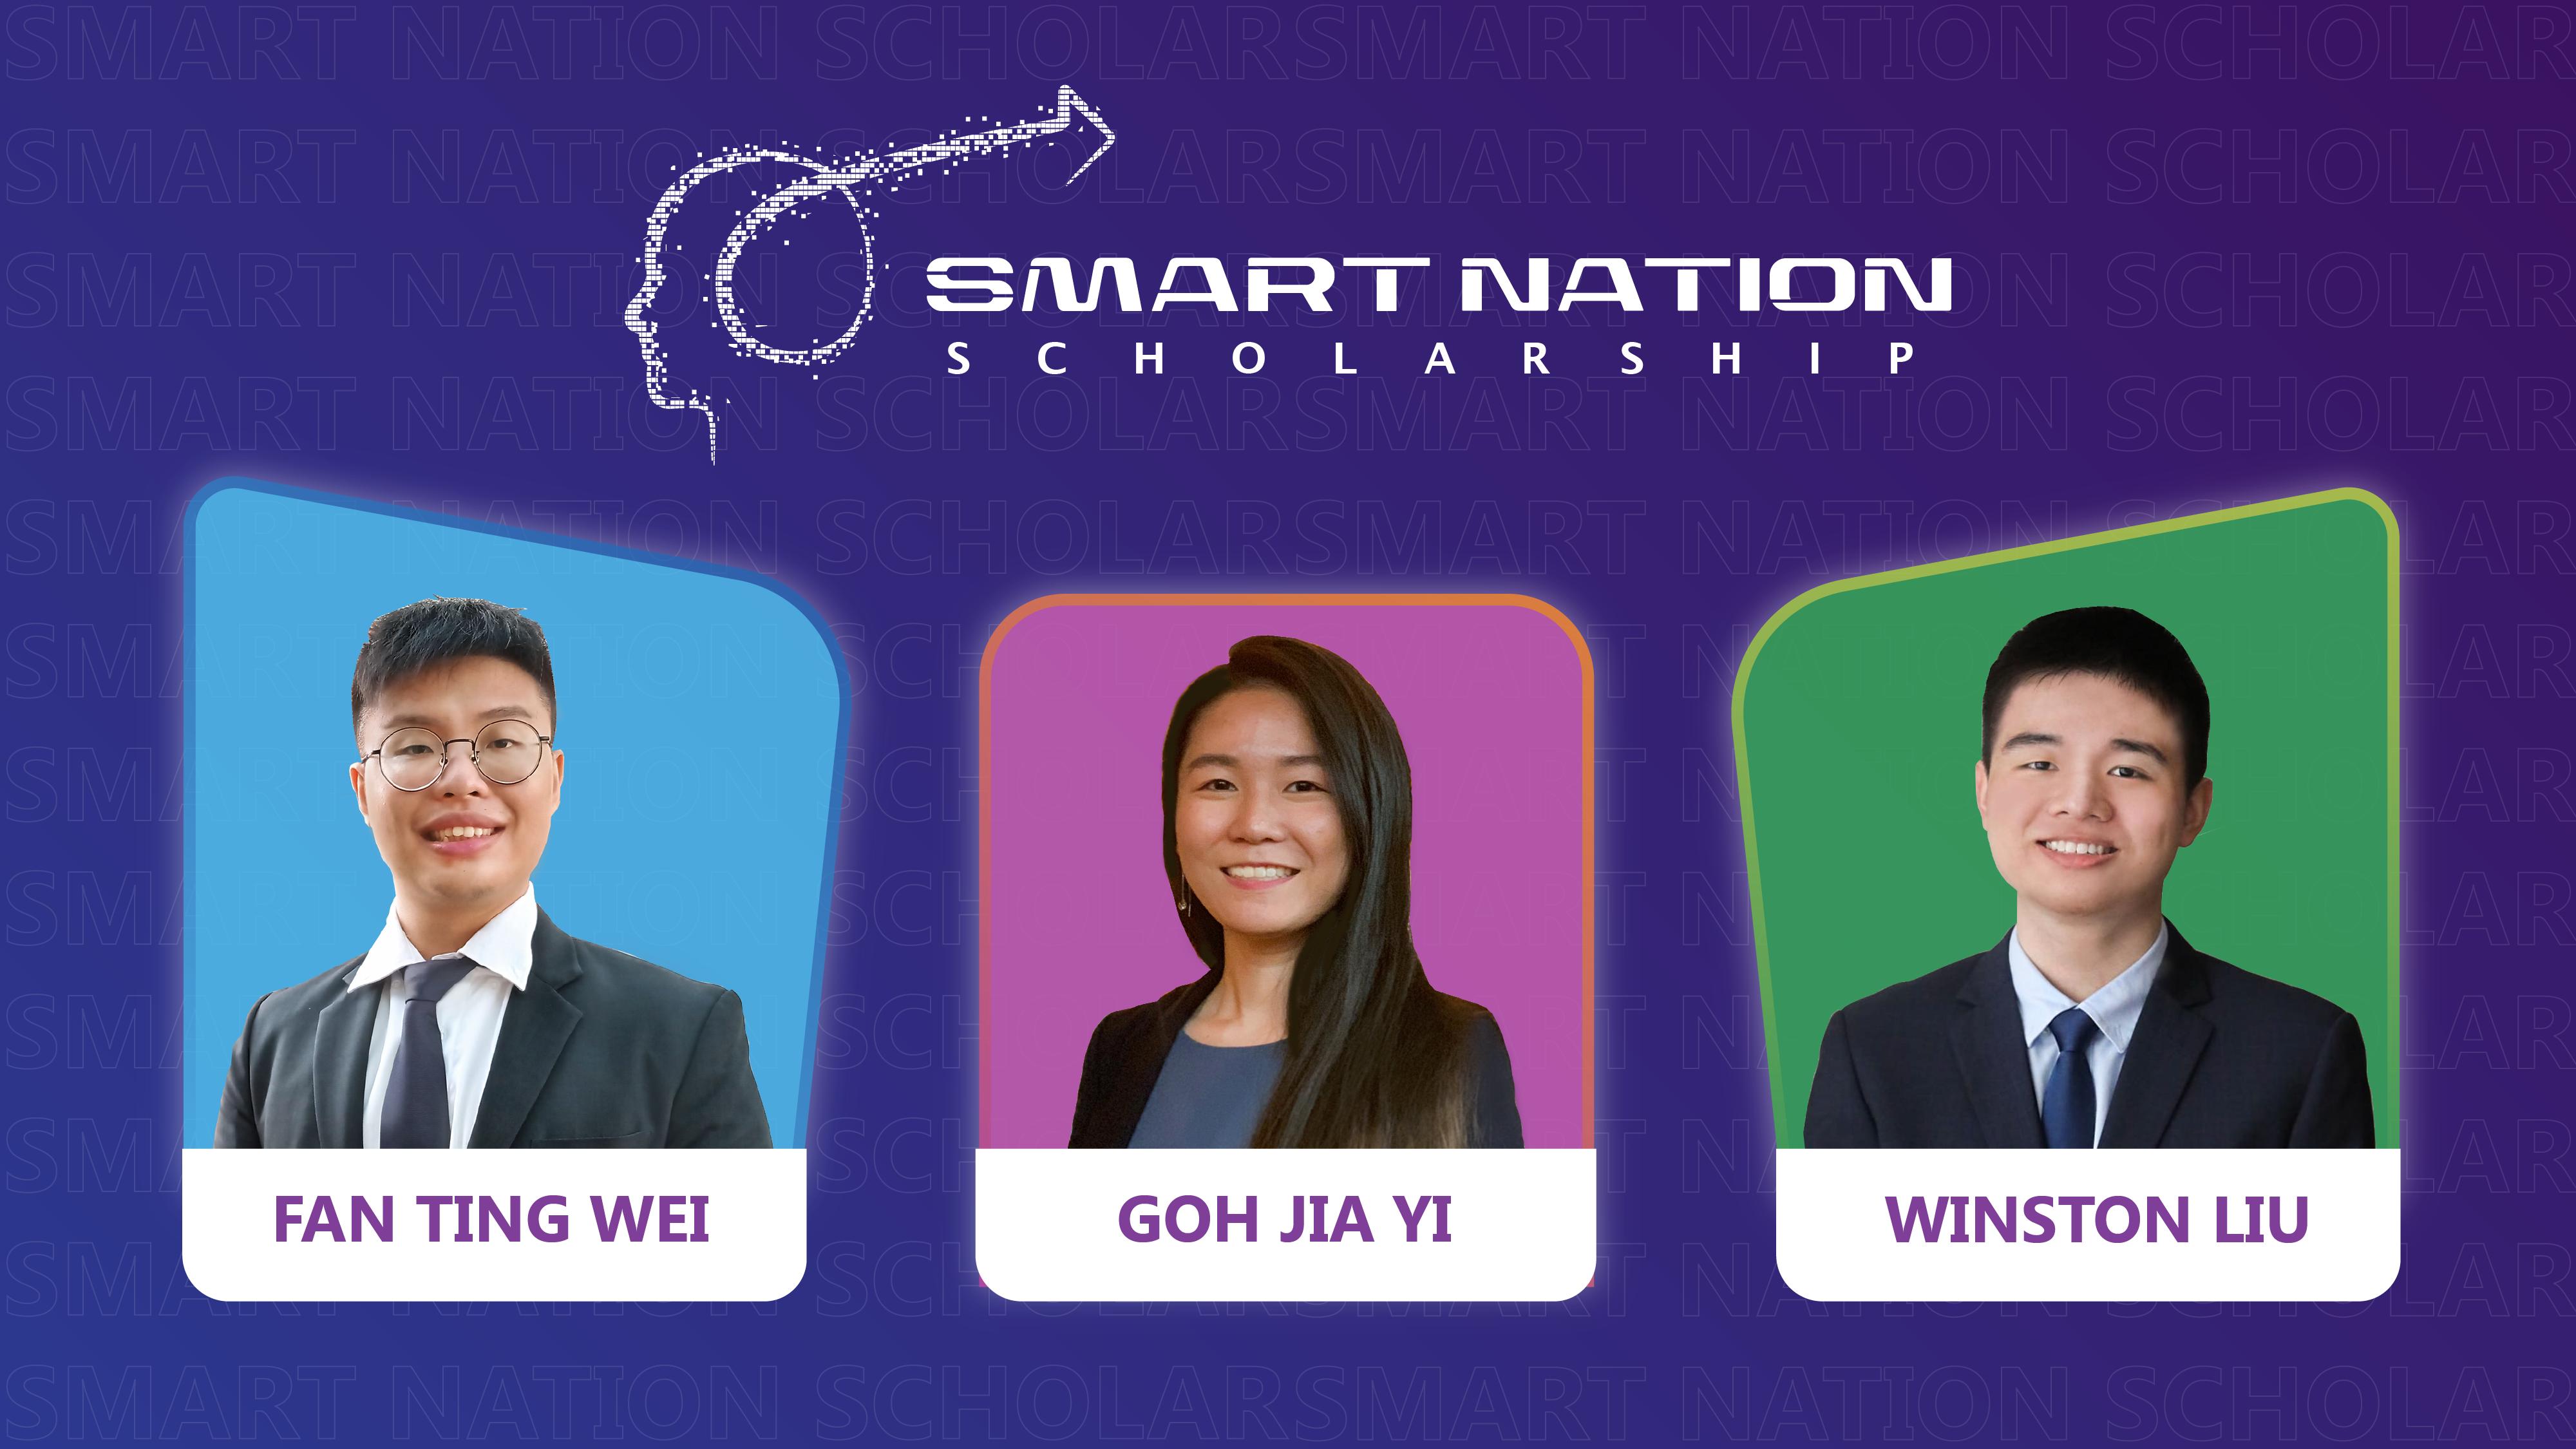 Smart Nation Scholars